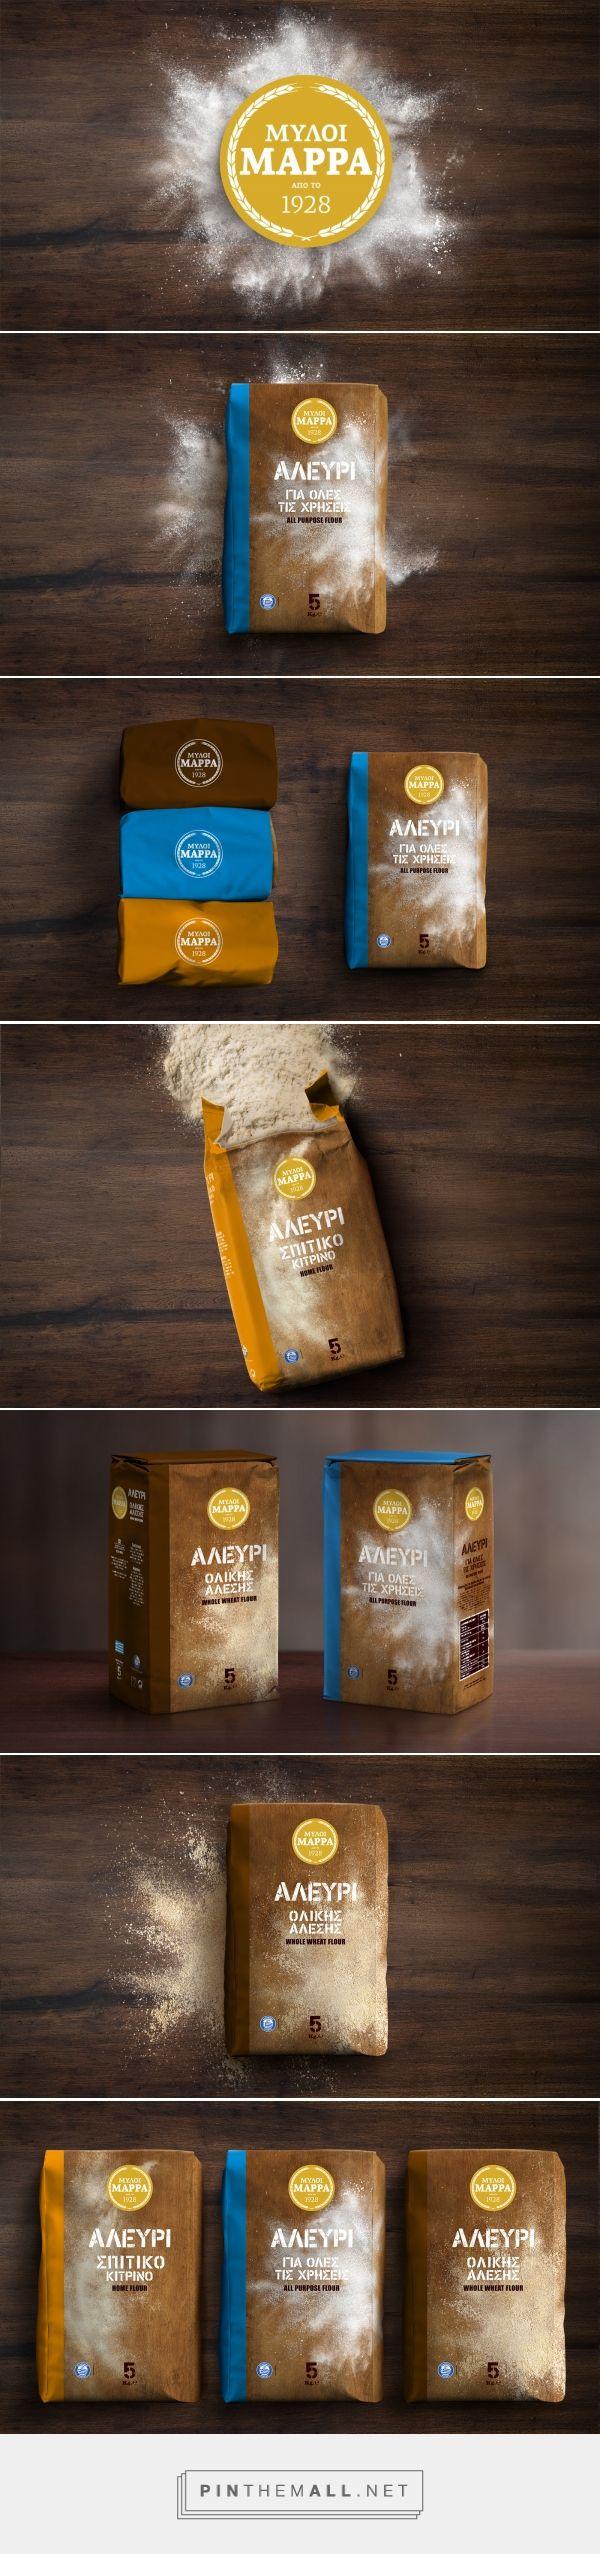 Myloi Marra flour packaging design by Antonia Skaraki - http://www.packagingoftheworld.com/2017/01/myloi-marra.html